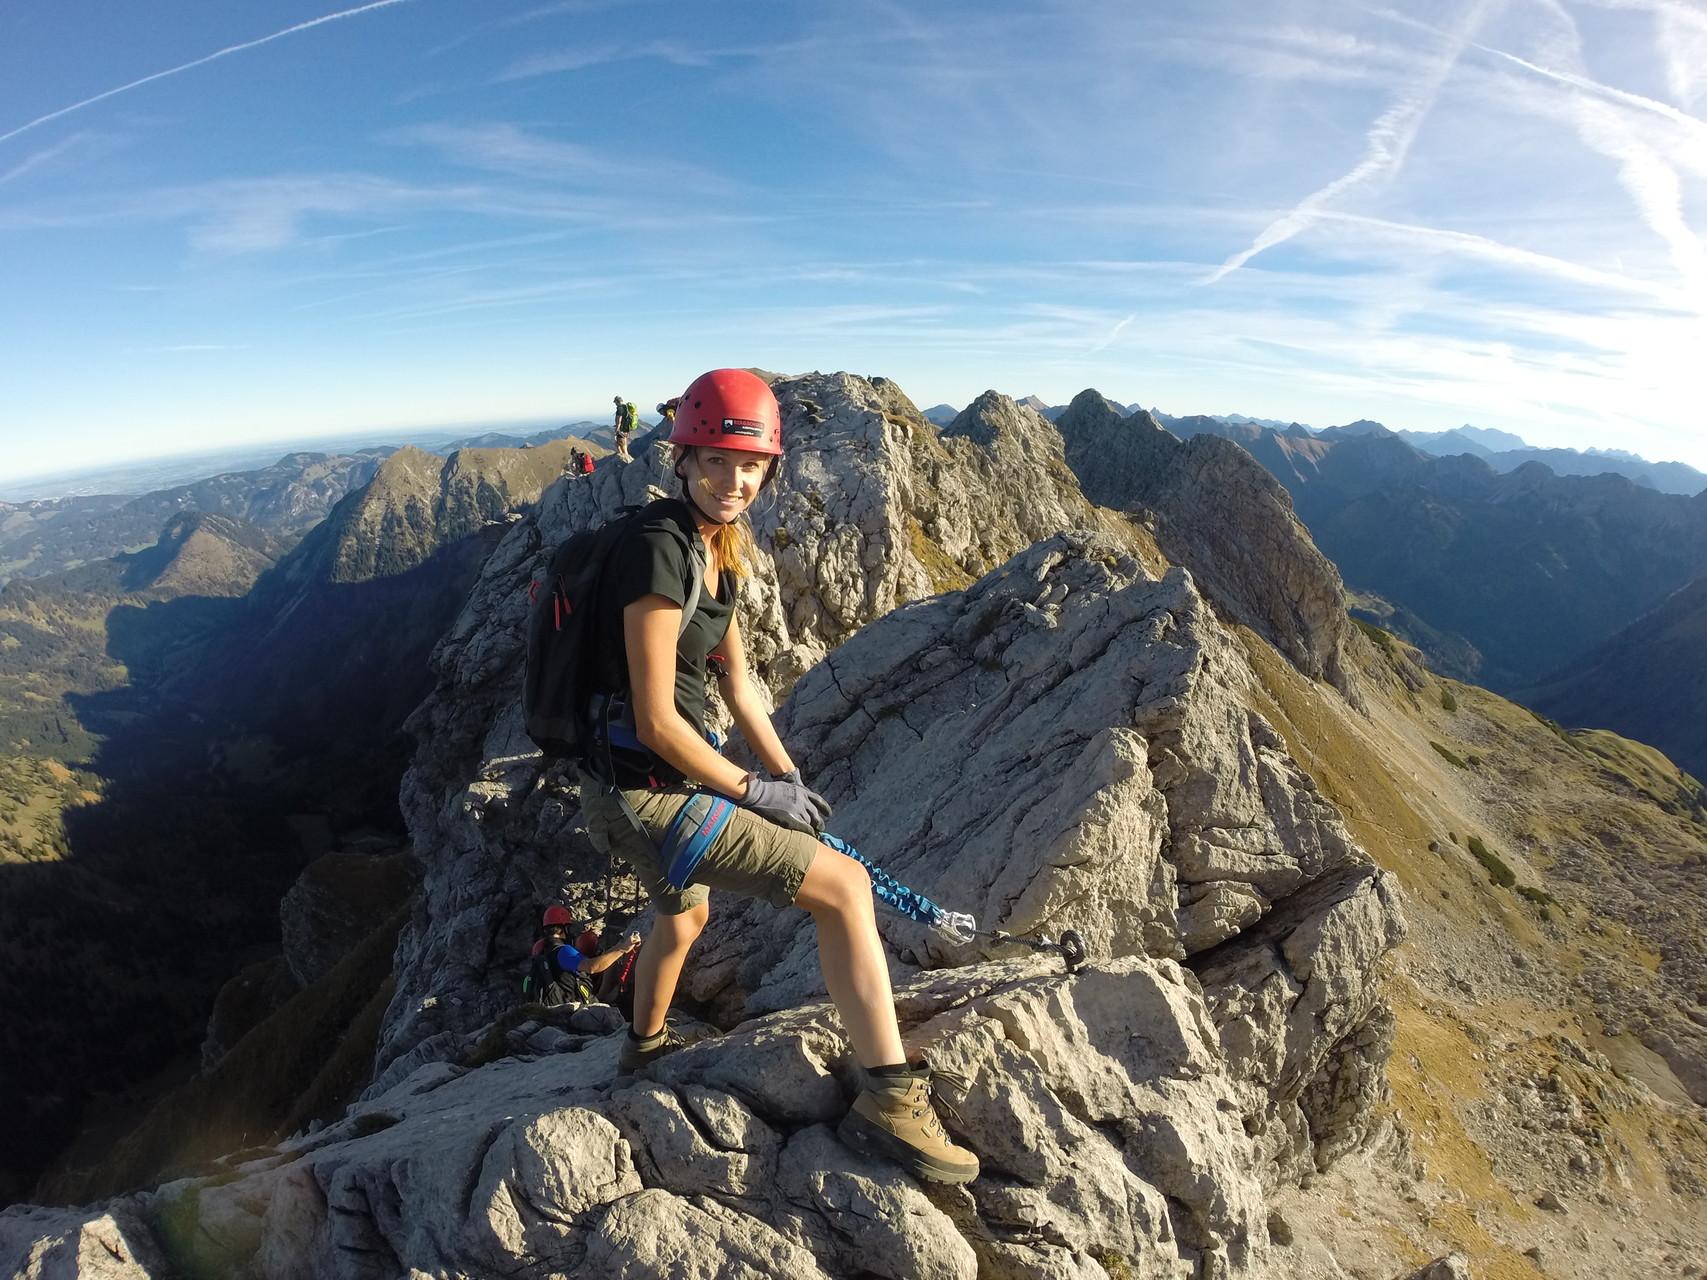 Klettersteig Hindelang : Unser erstes klettersteigerlebnis vom nebelhorngipfel über den